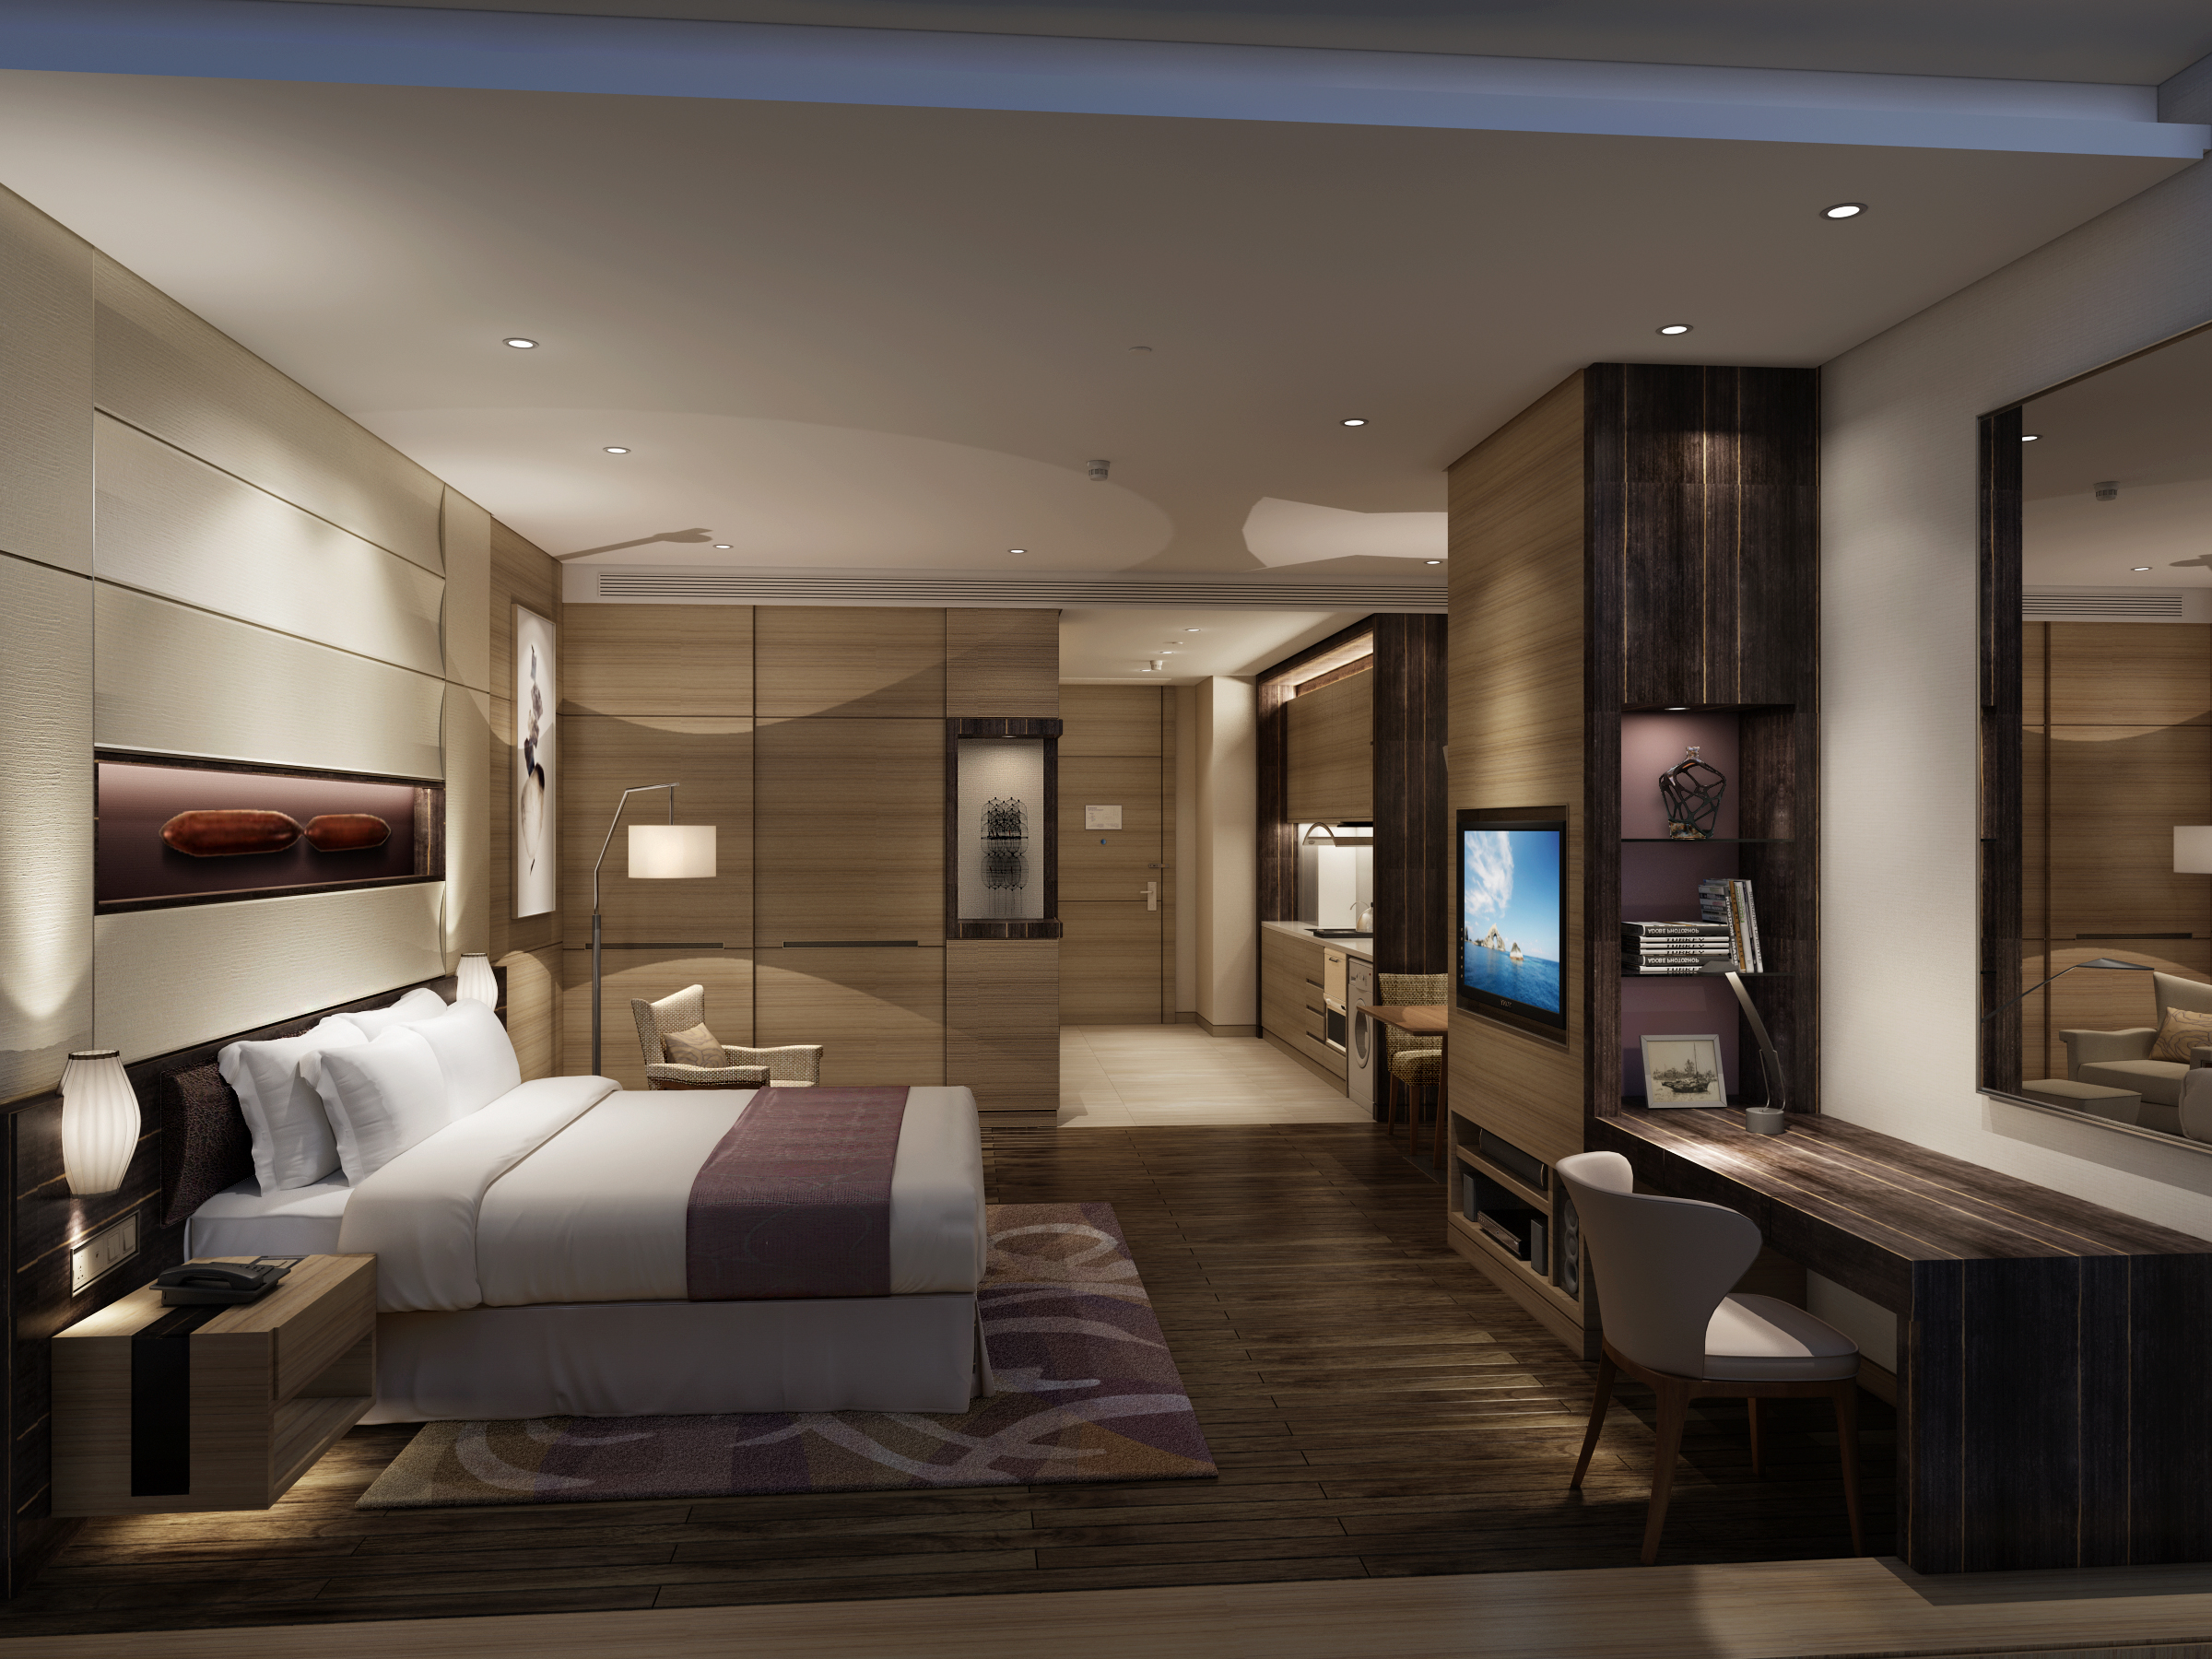 Ascott Serviced Apartment Wuxi Architect Magazine